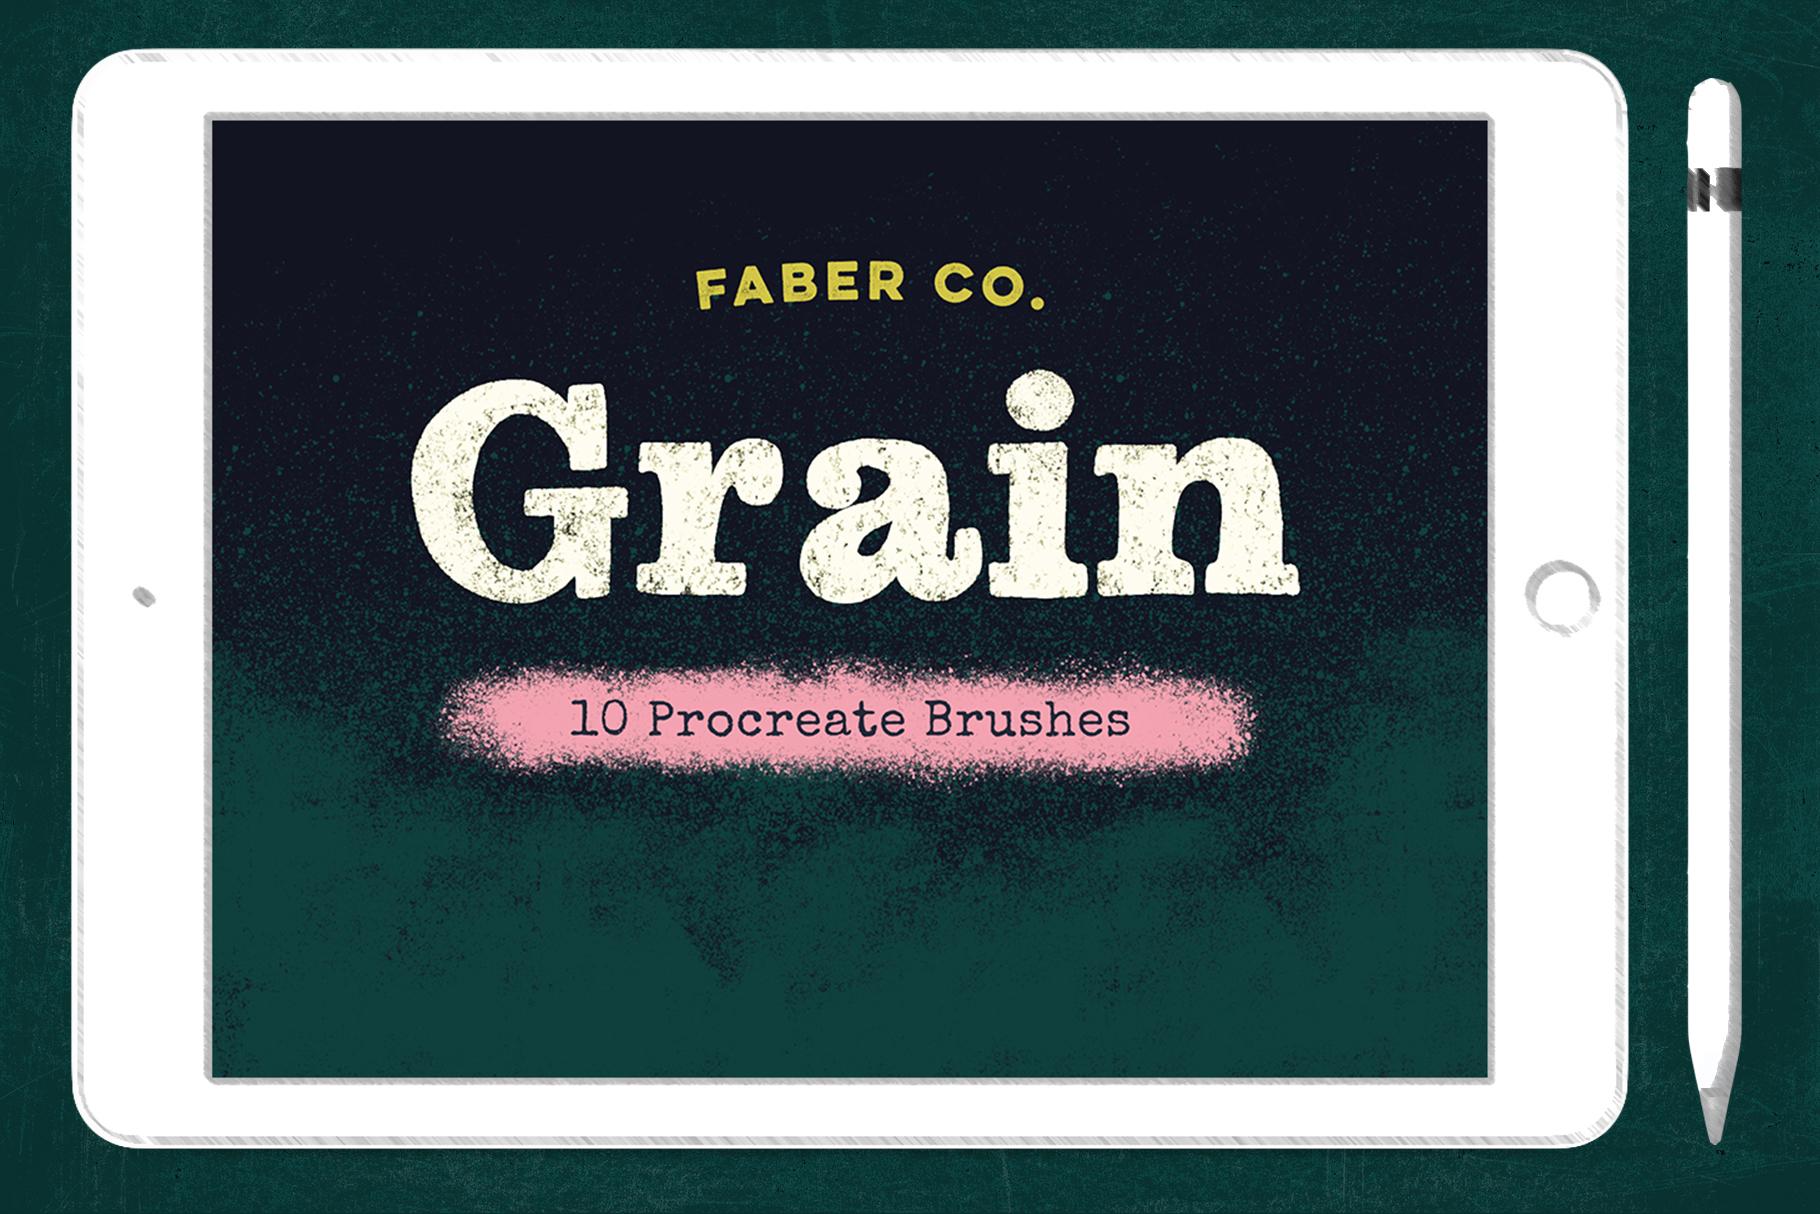 01_FINAL_Grain-Brushes_FaberCo-Cover-1820x1214_no2.jpg